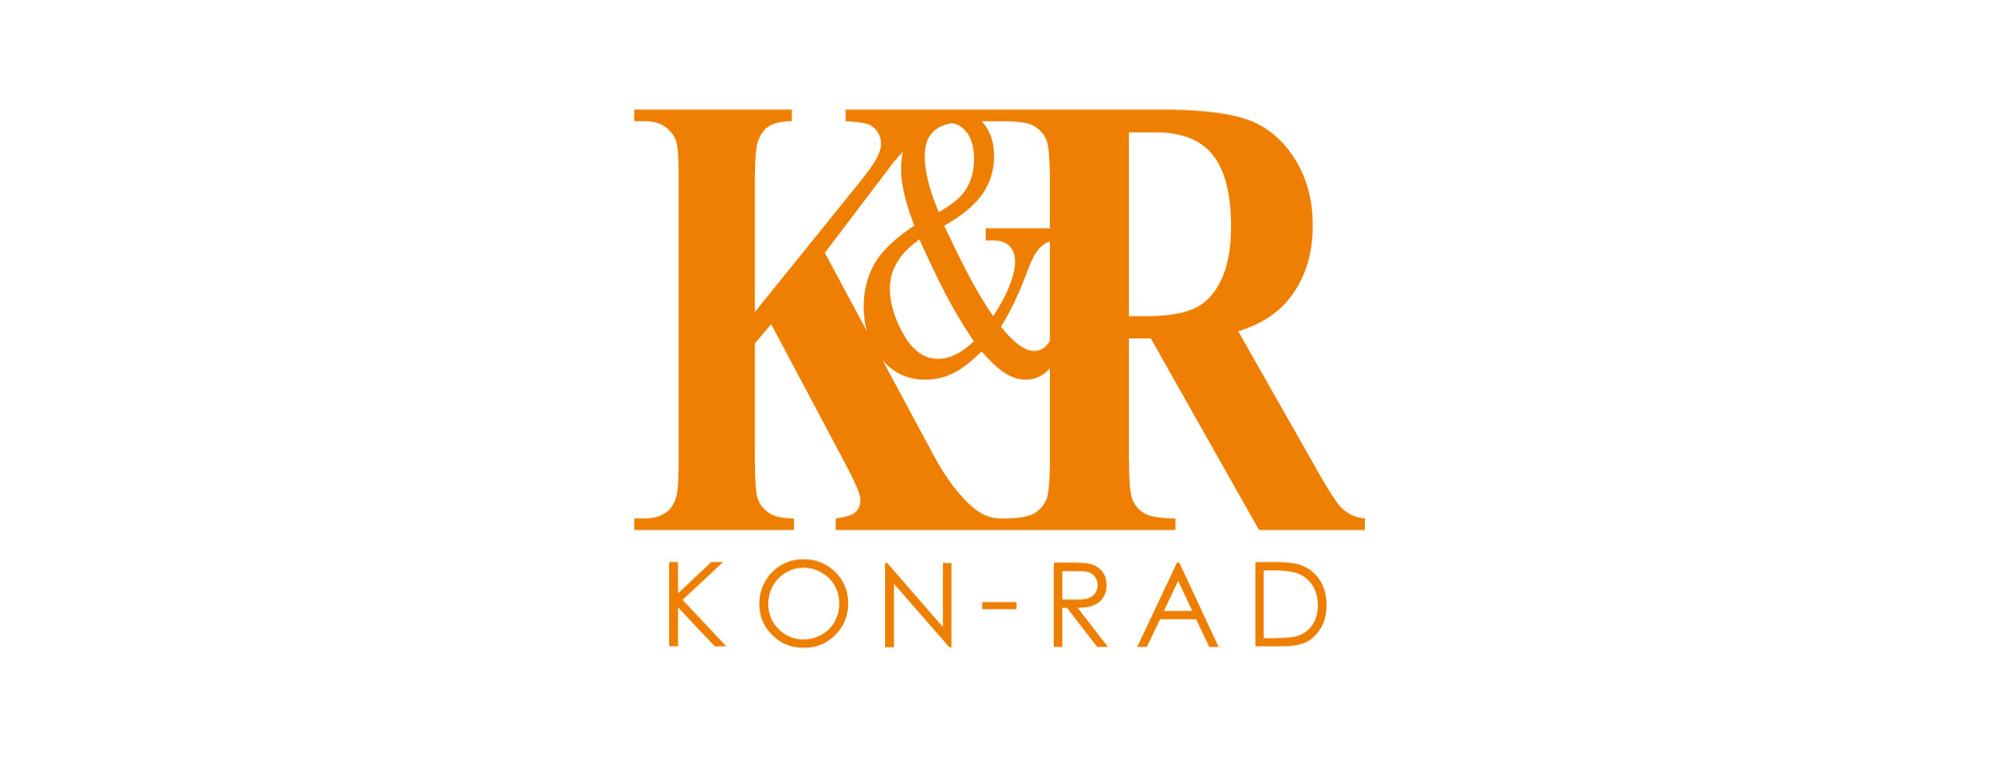 klient-wooacademy-kon-rad-logo